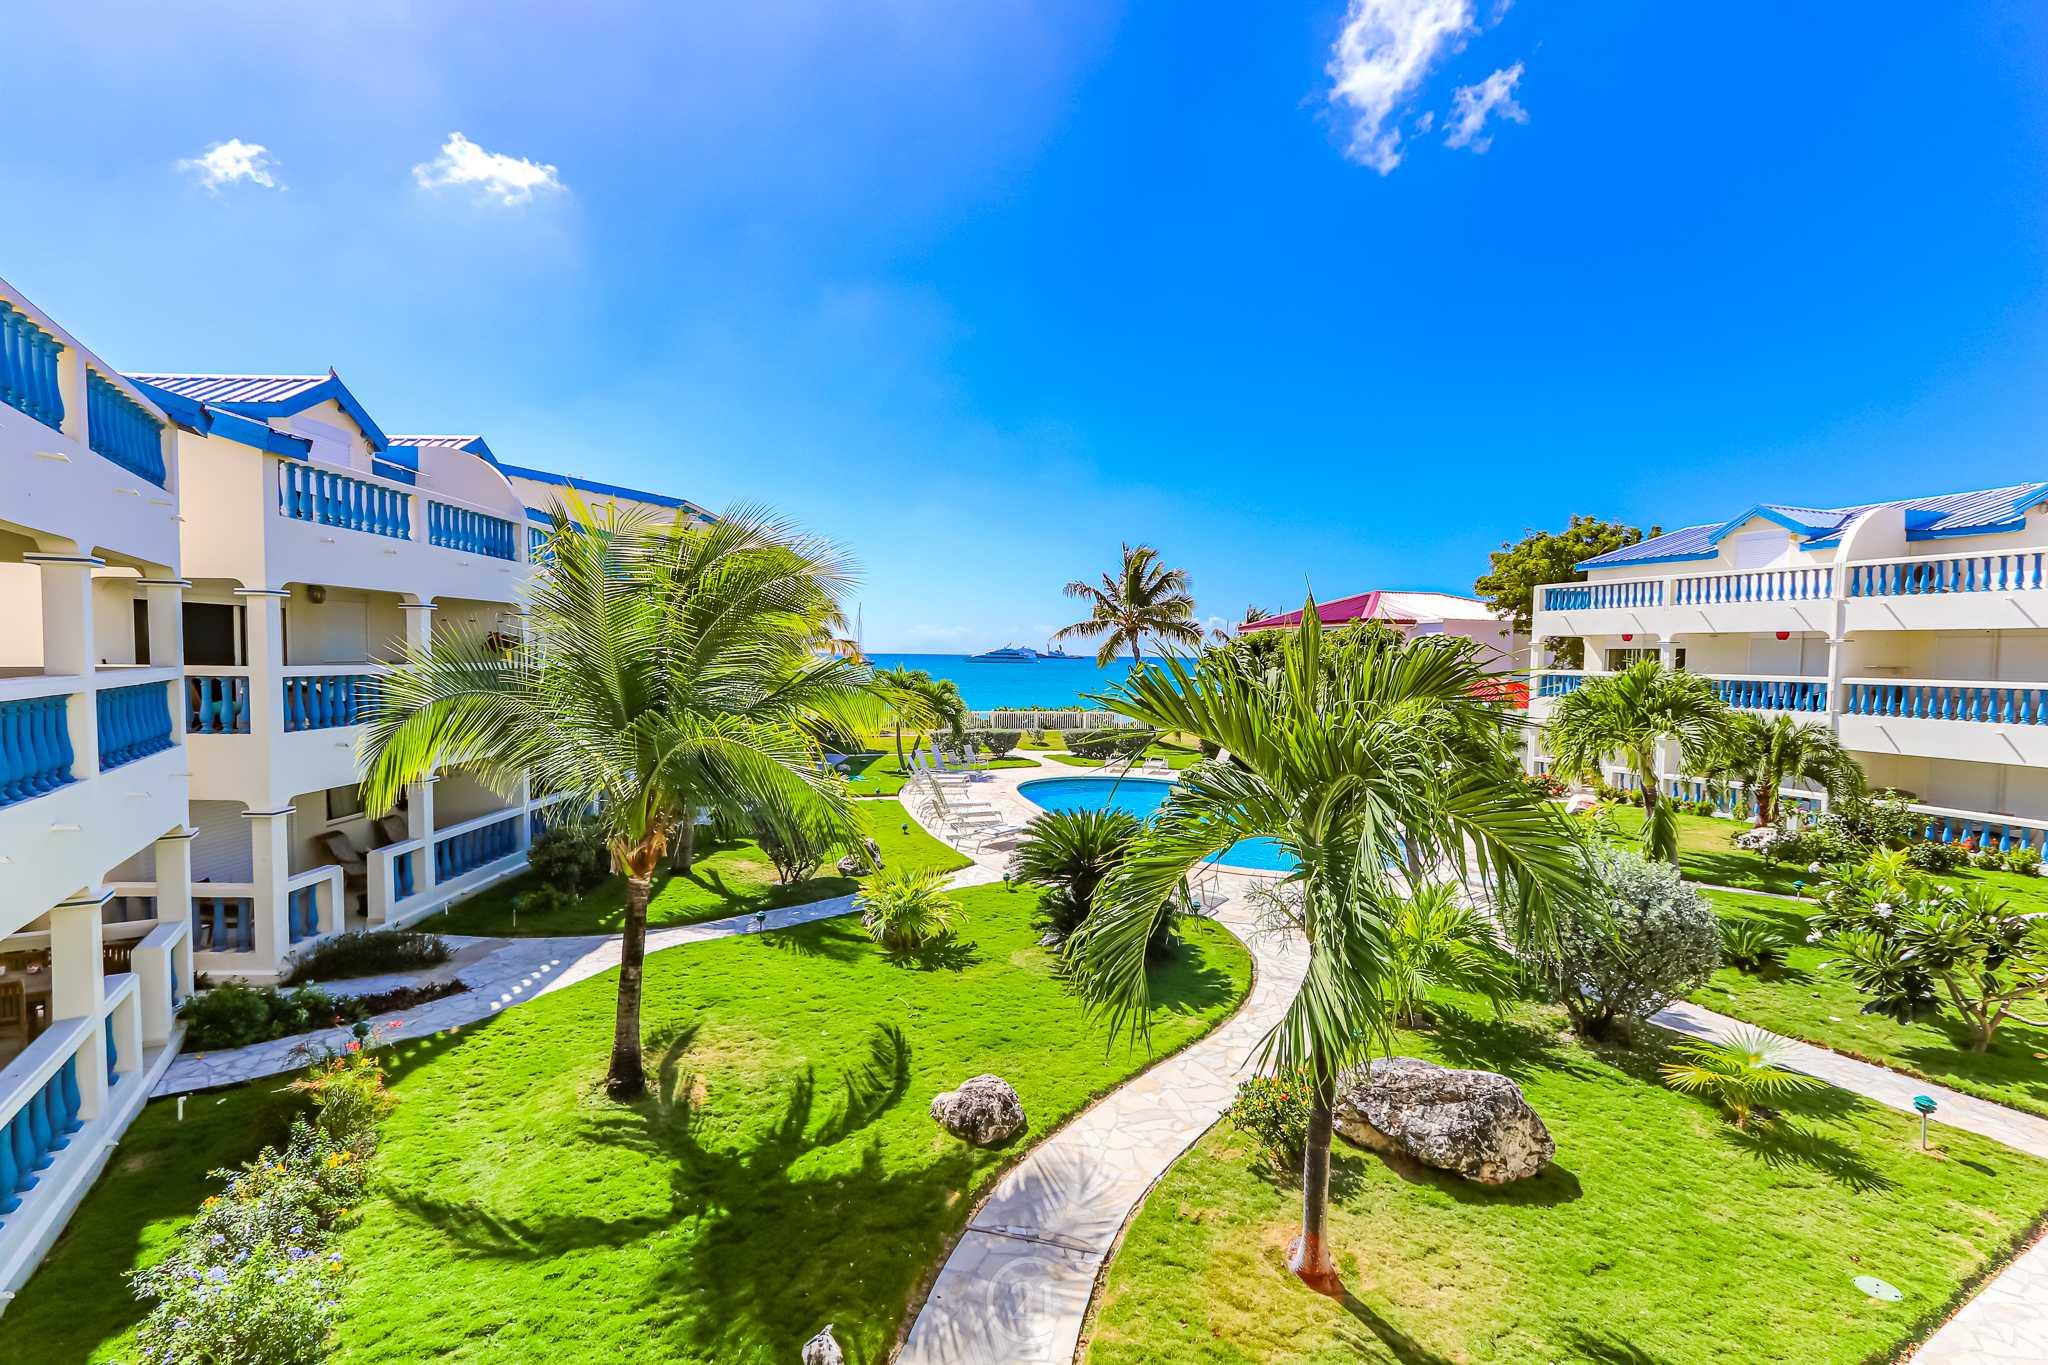 Simpson Bay Palm Beach St Maarten Condo For Sale